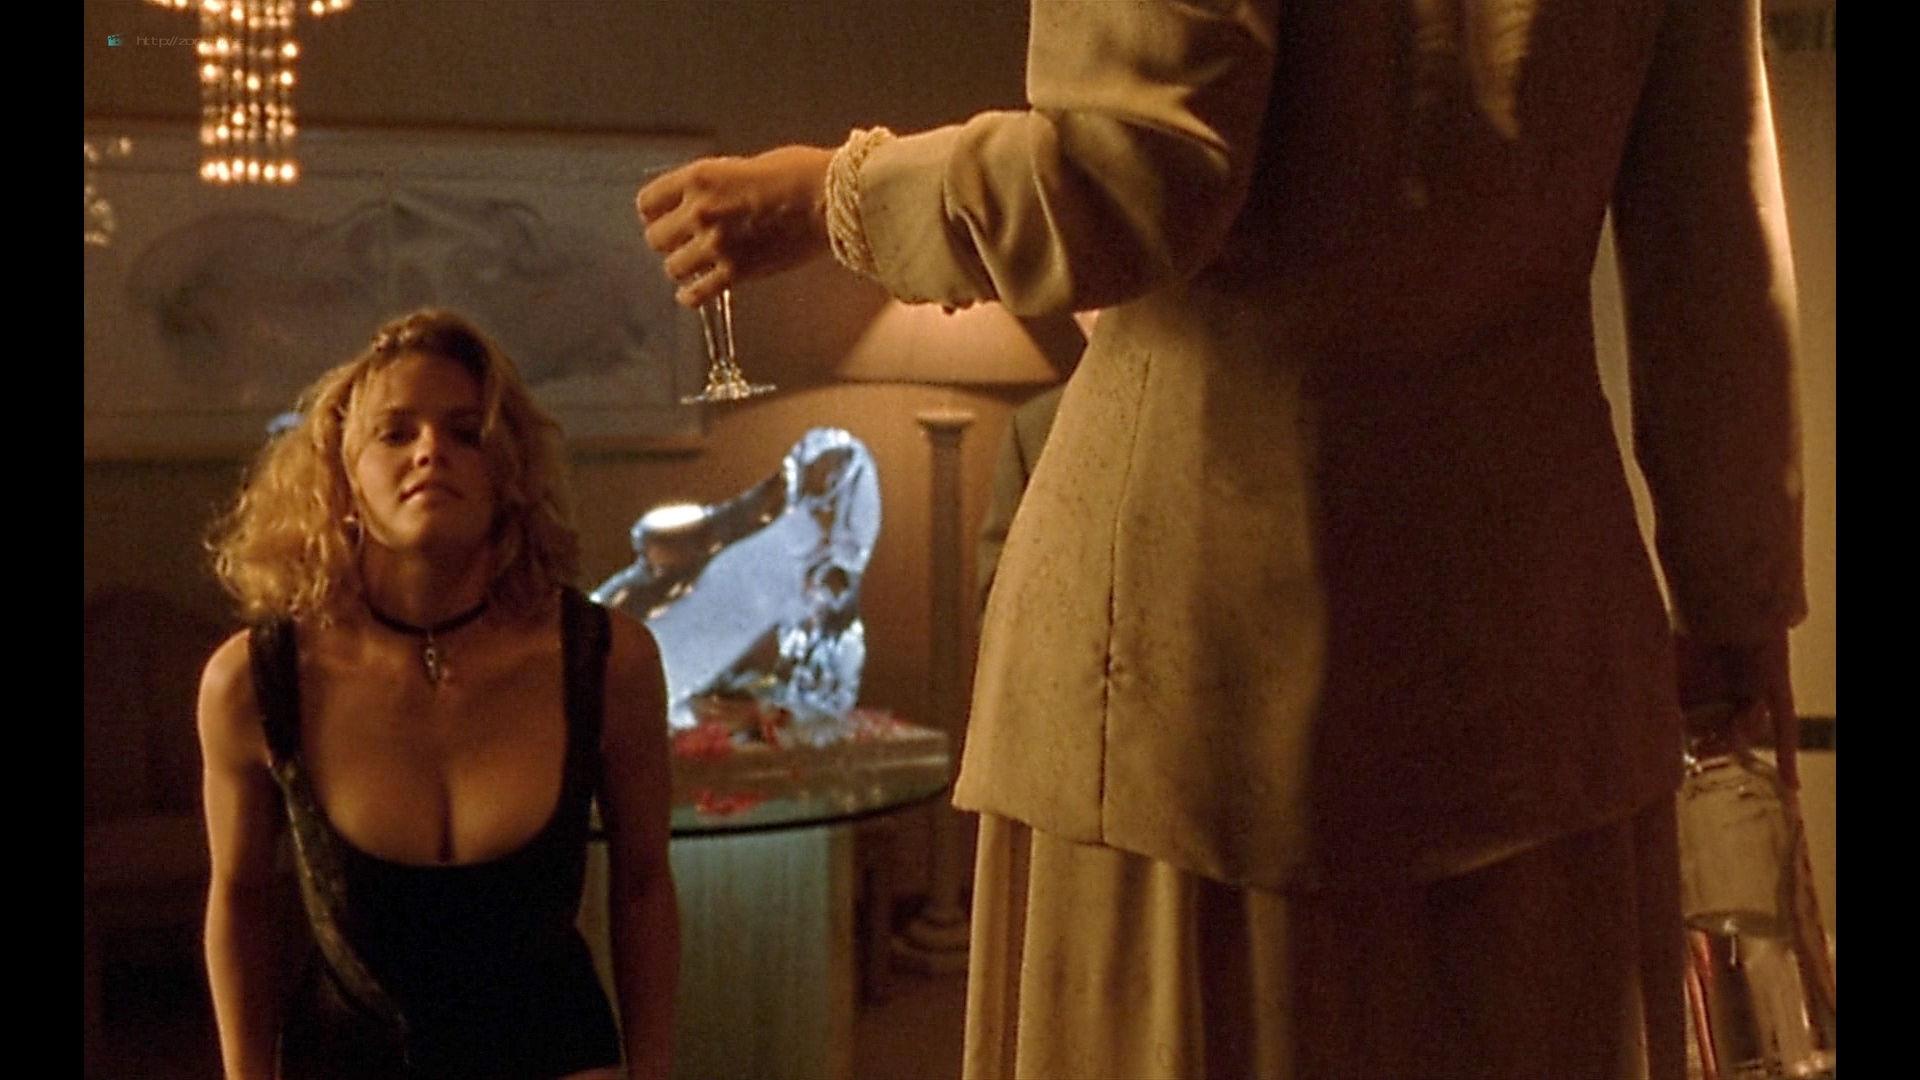 Elisabeth Shue nude topless sex - Leaving Las Vegas (1995) HD 1080p BluRay (16)